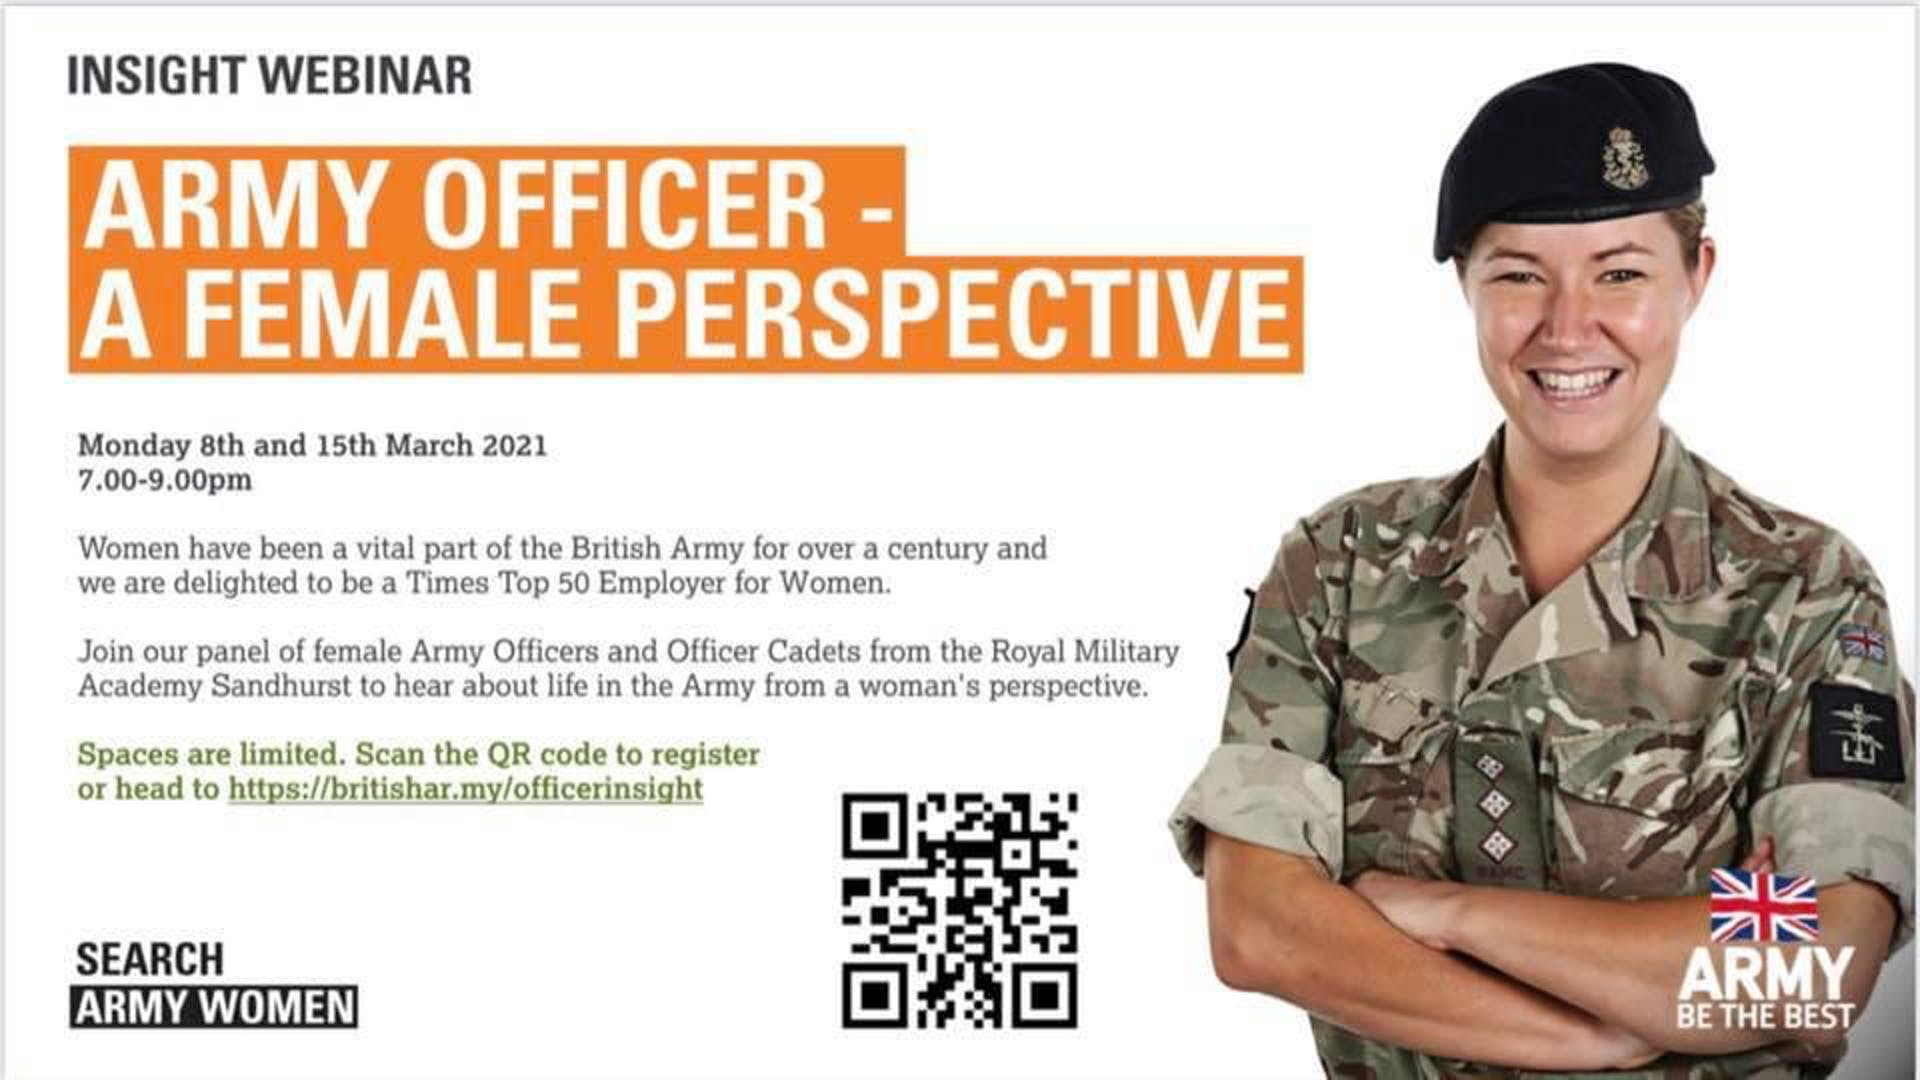 British Army Officer Insights Webinar